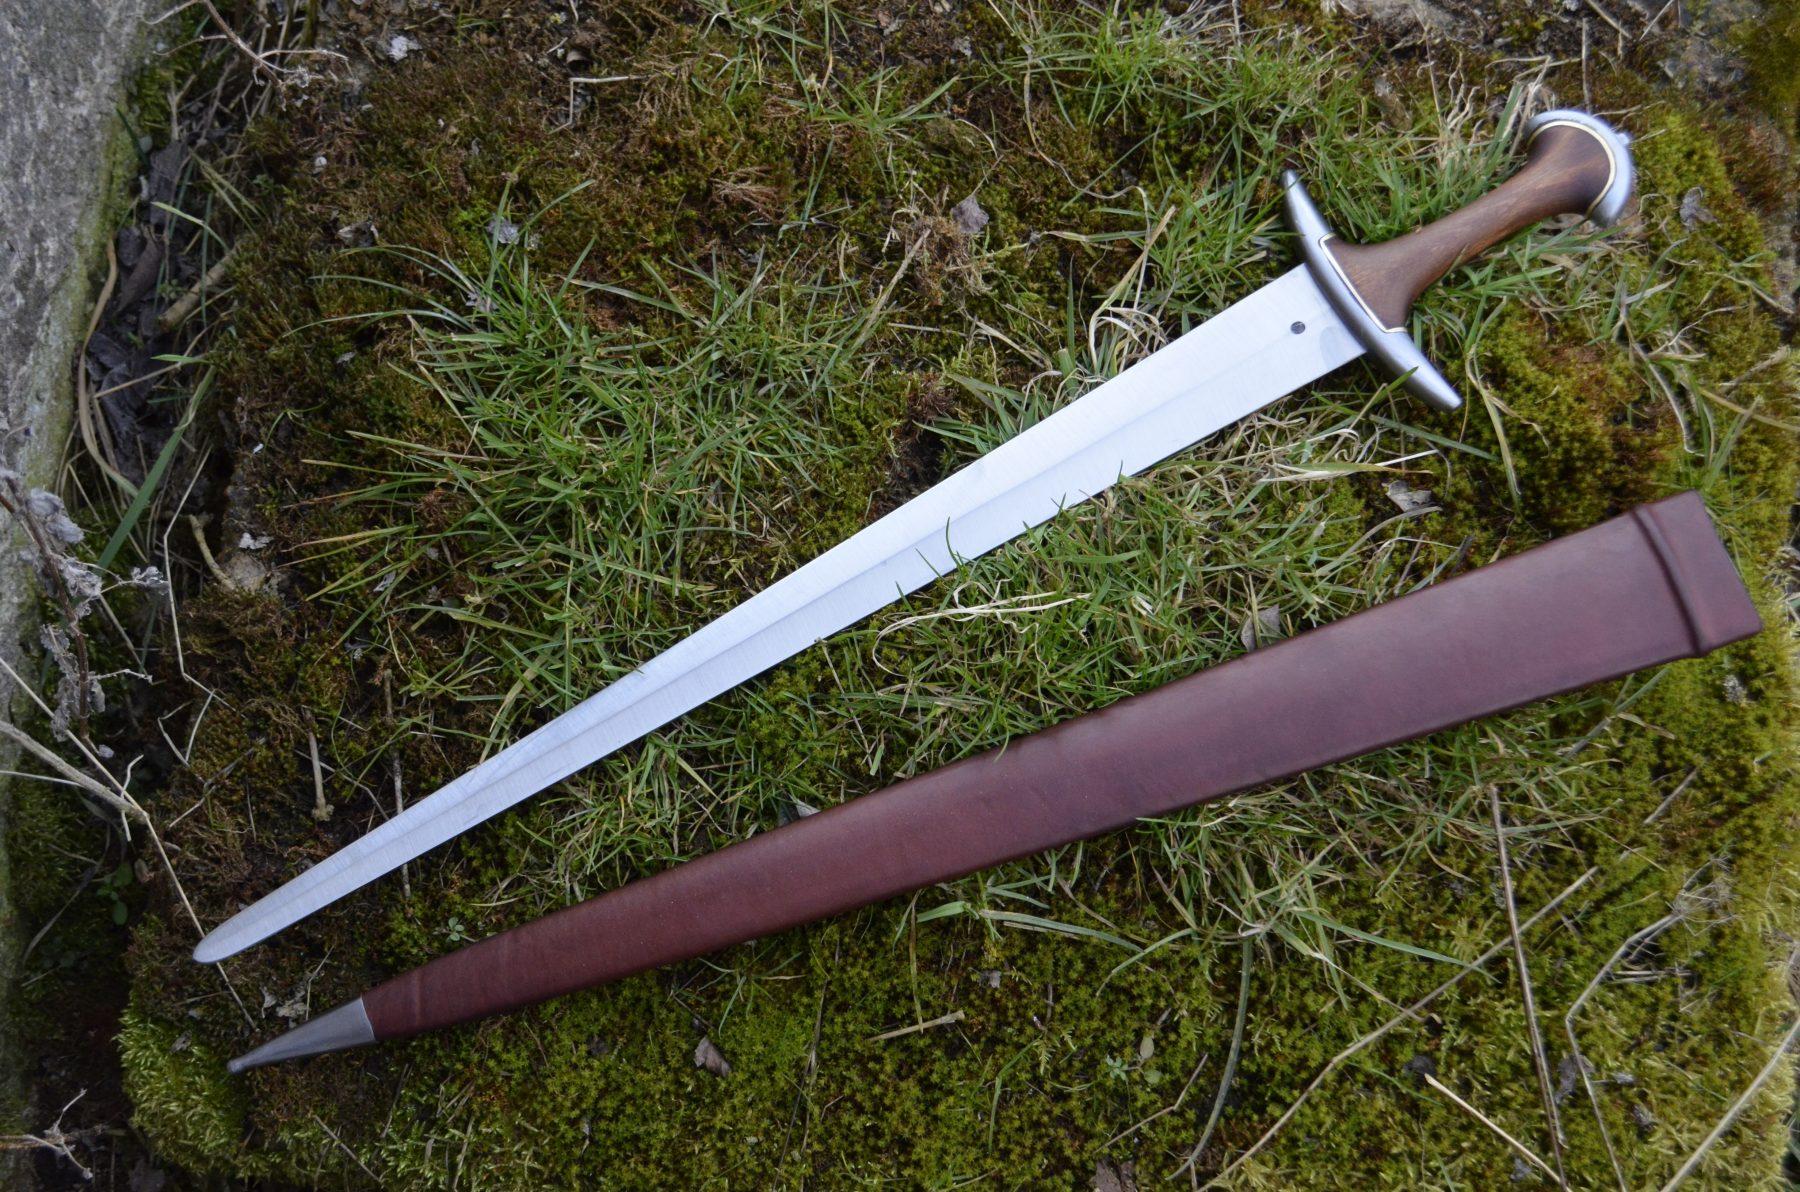 Baselard Swiss Sword